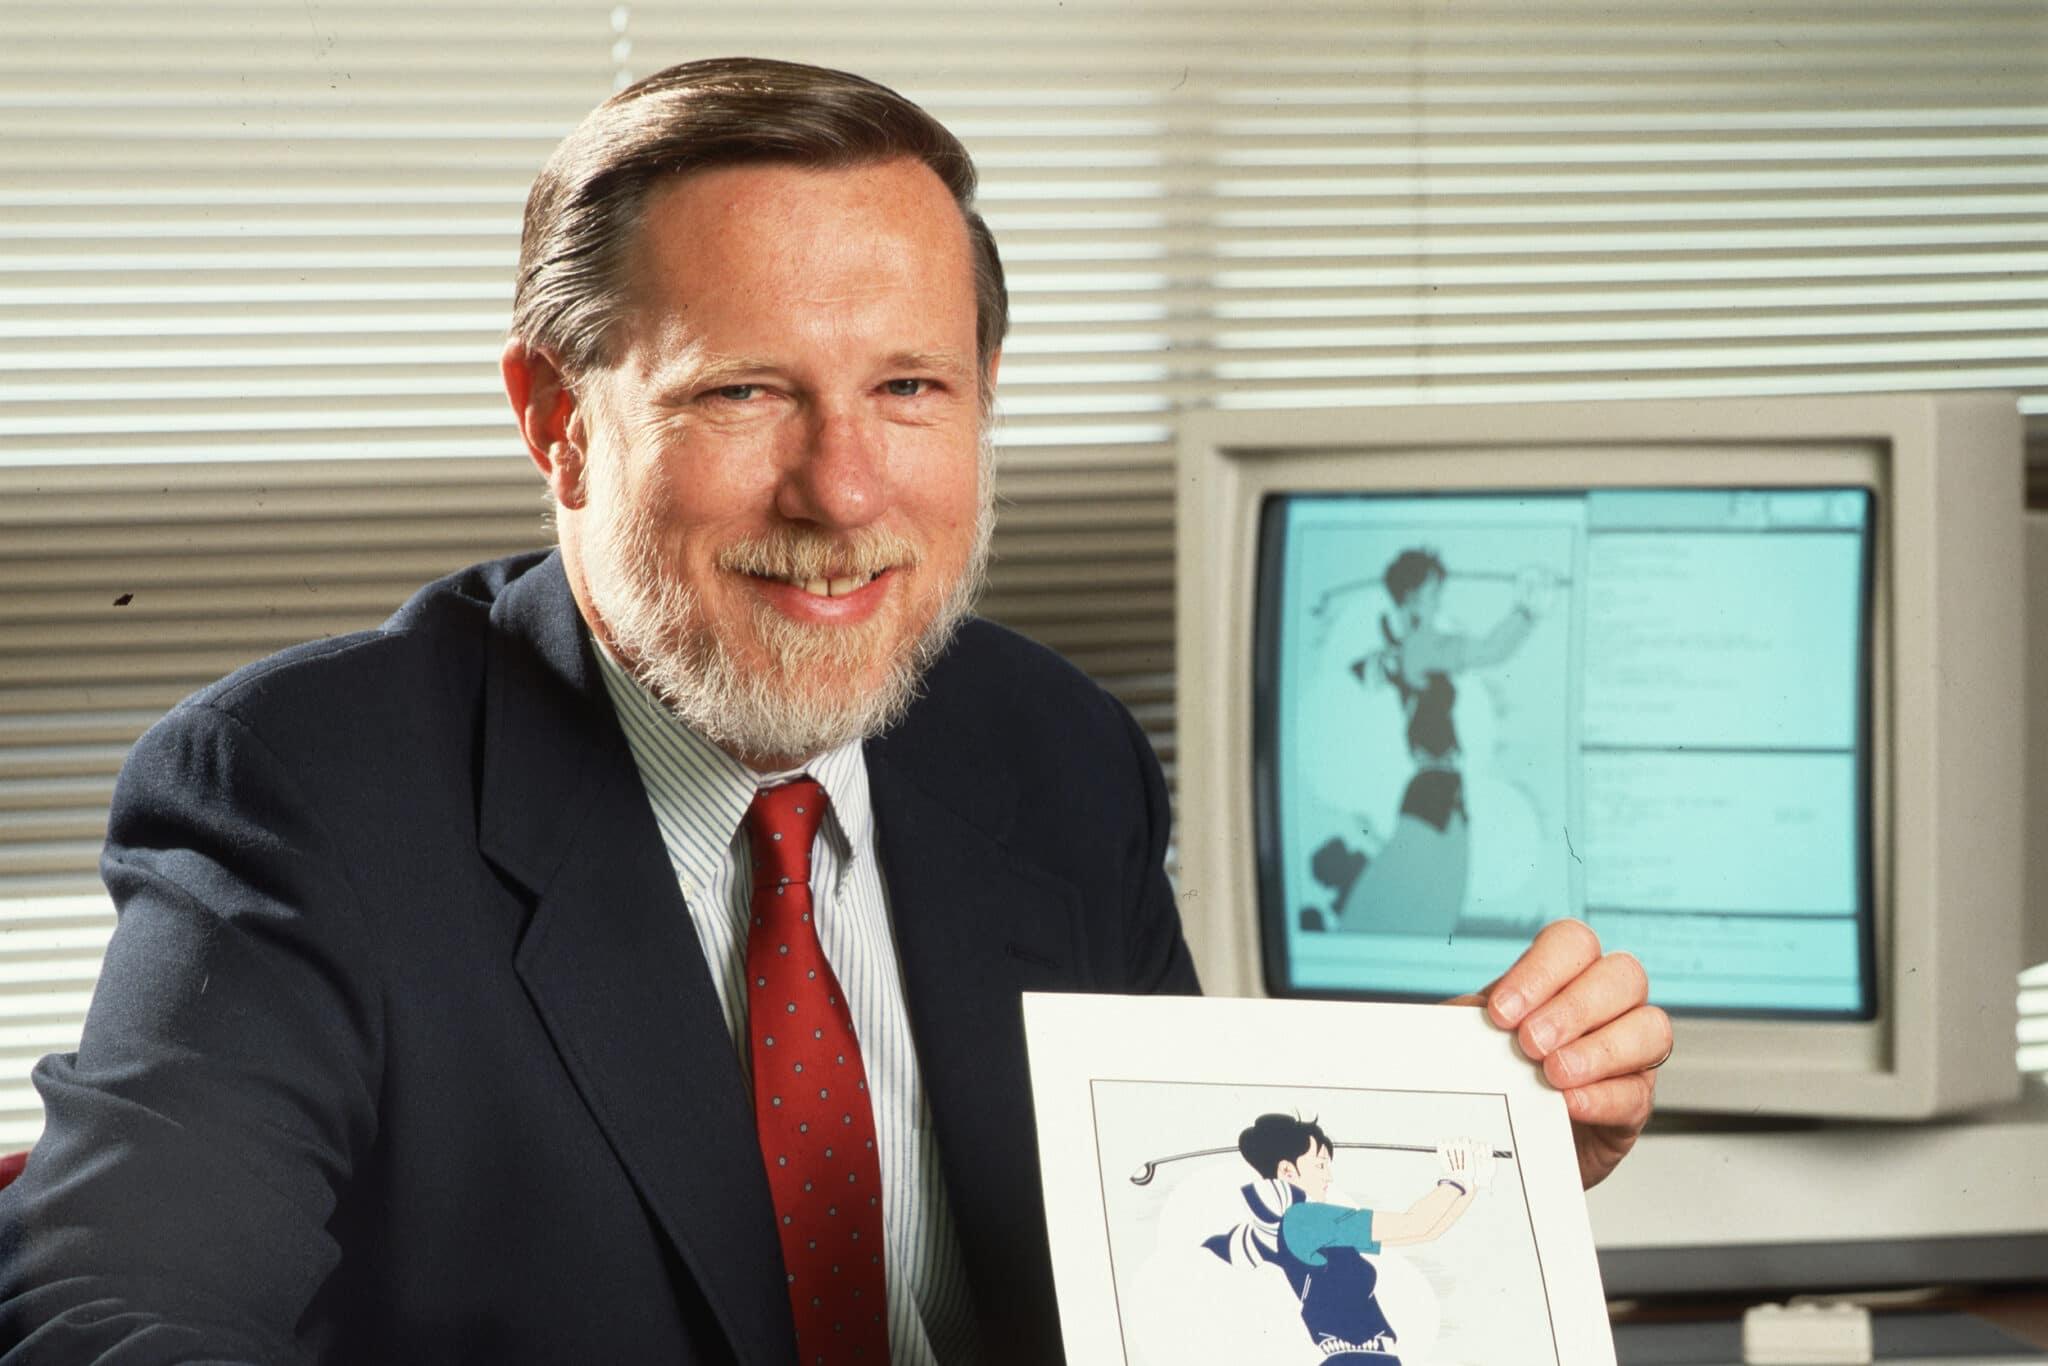 Charles Geschke inventore Adobe PDF